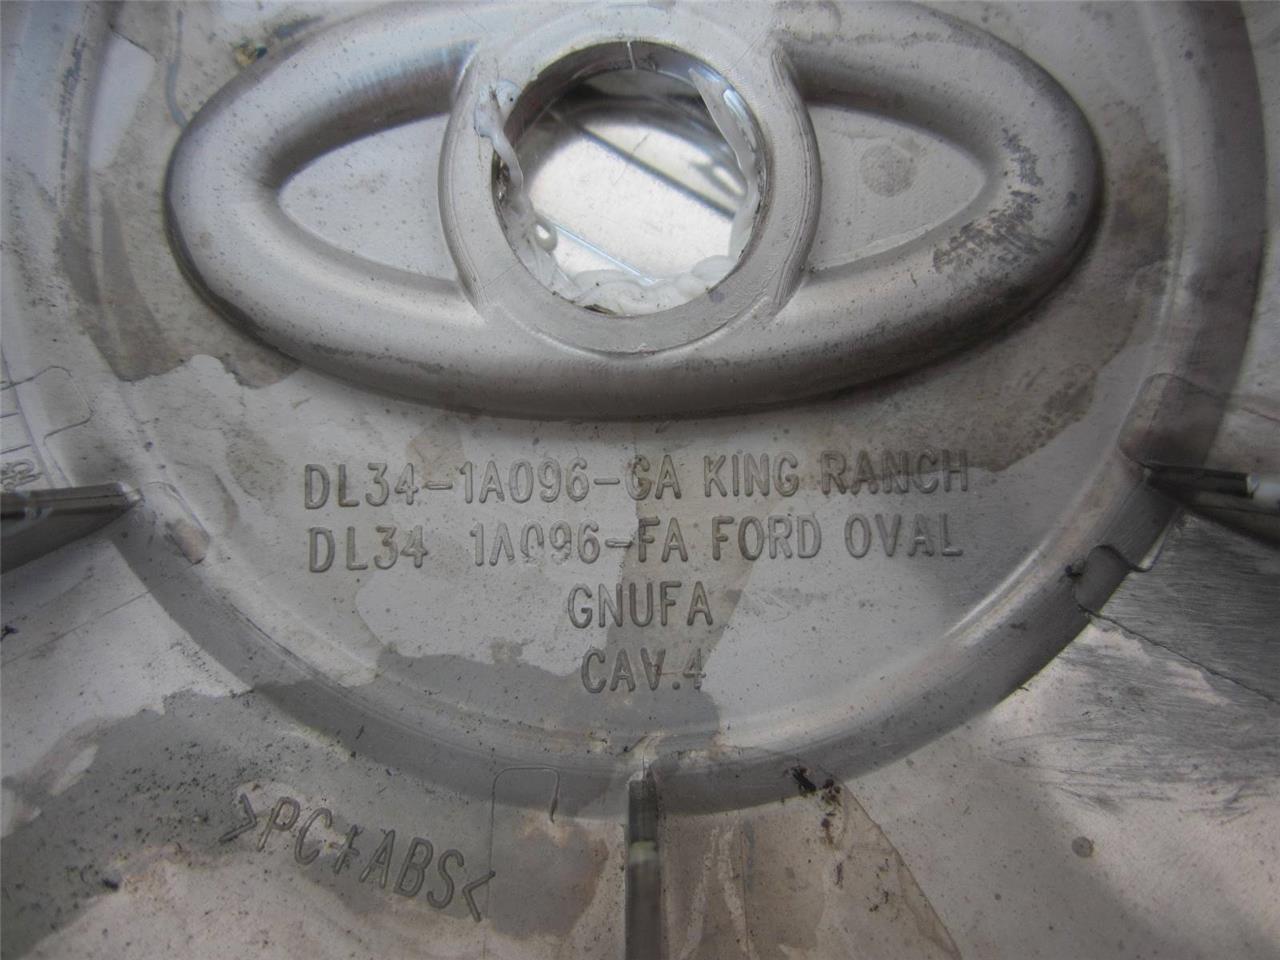 DL34-1A096-GA OEM 2009-2014 FORD F-150 F150 KING RANCH CHROME CENTER CAP HUB CAP